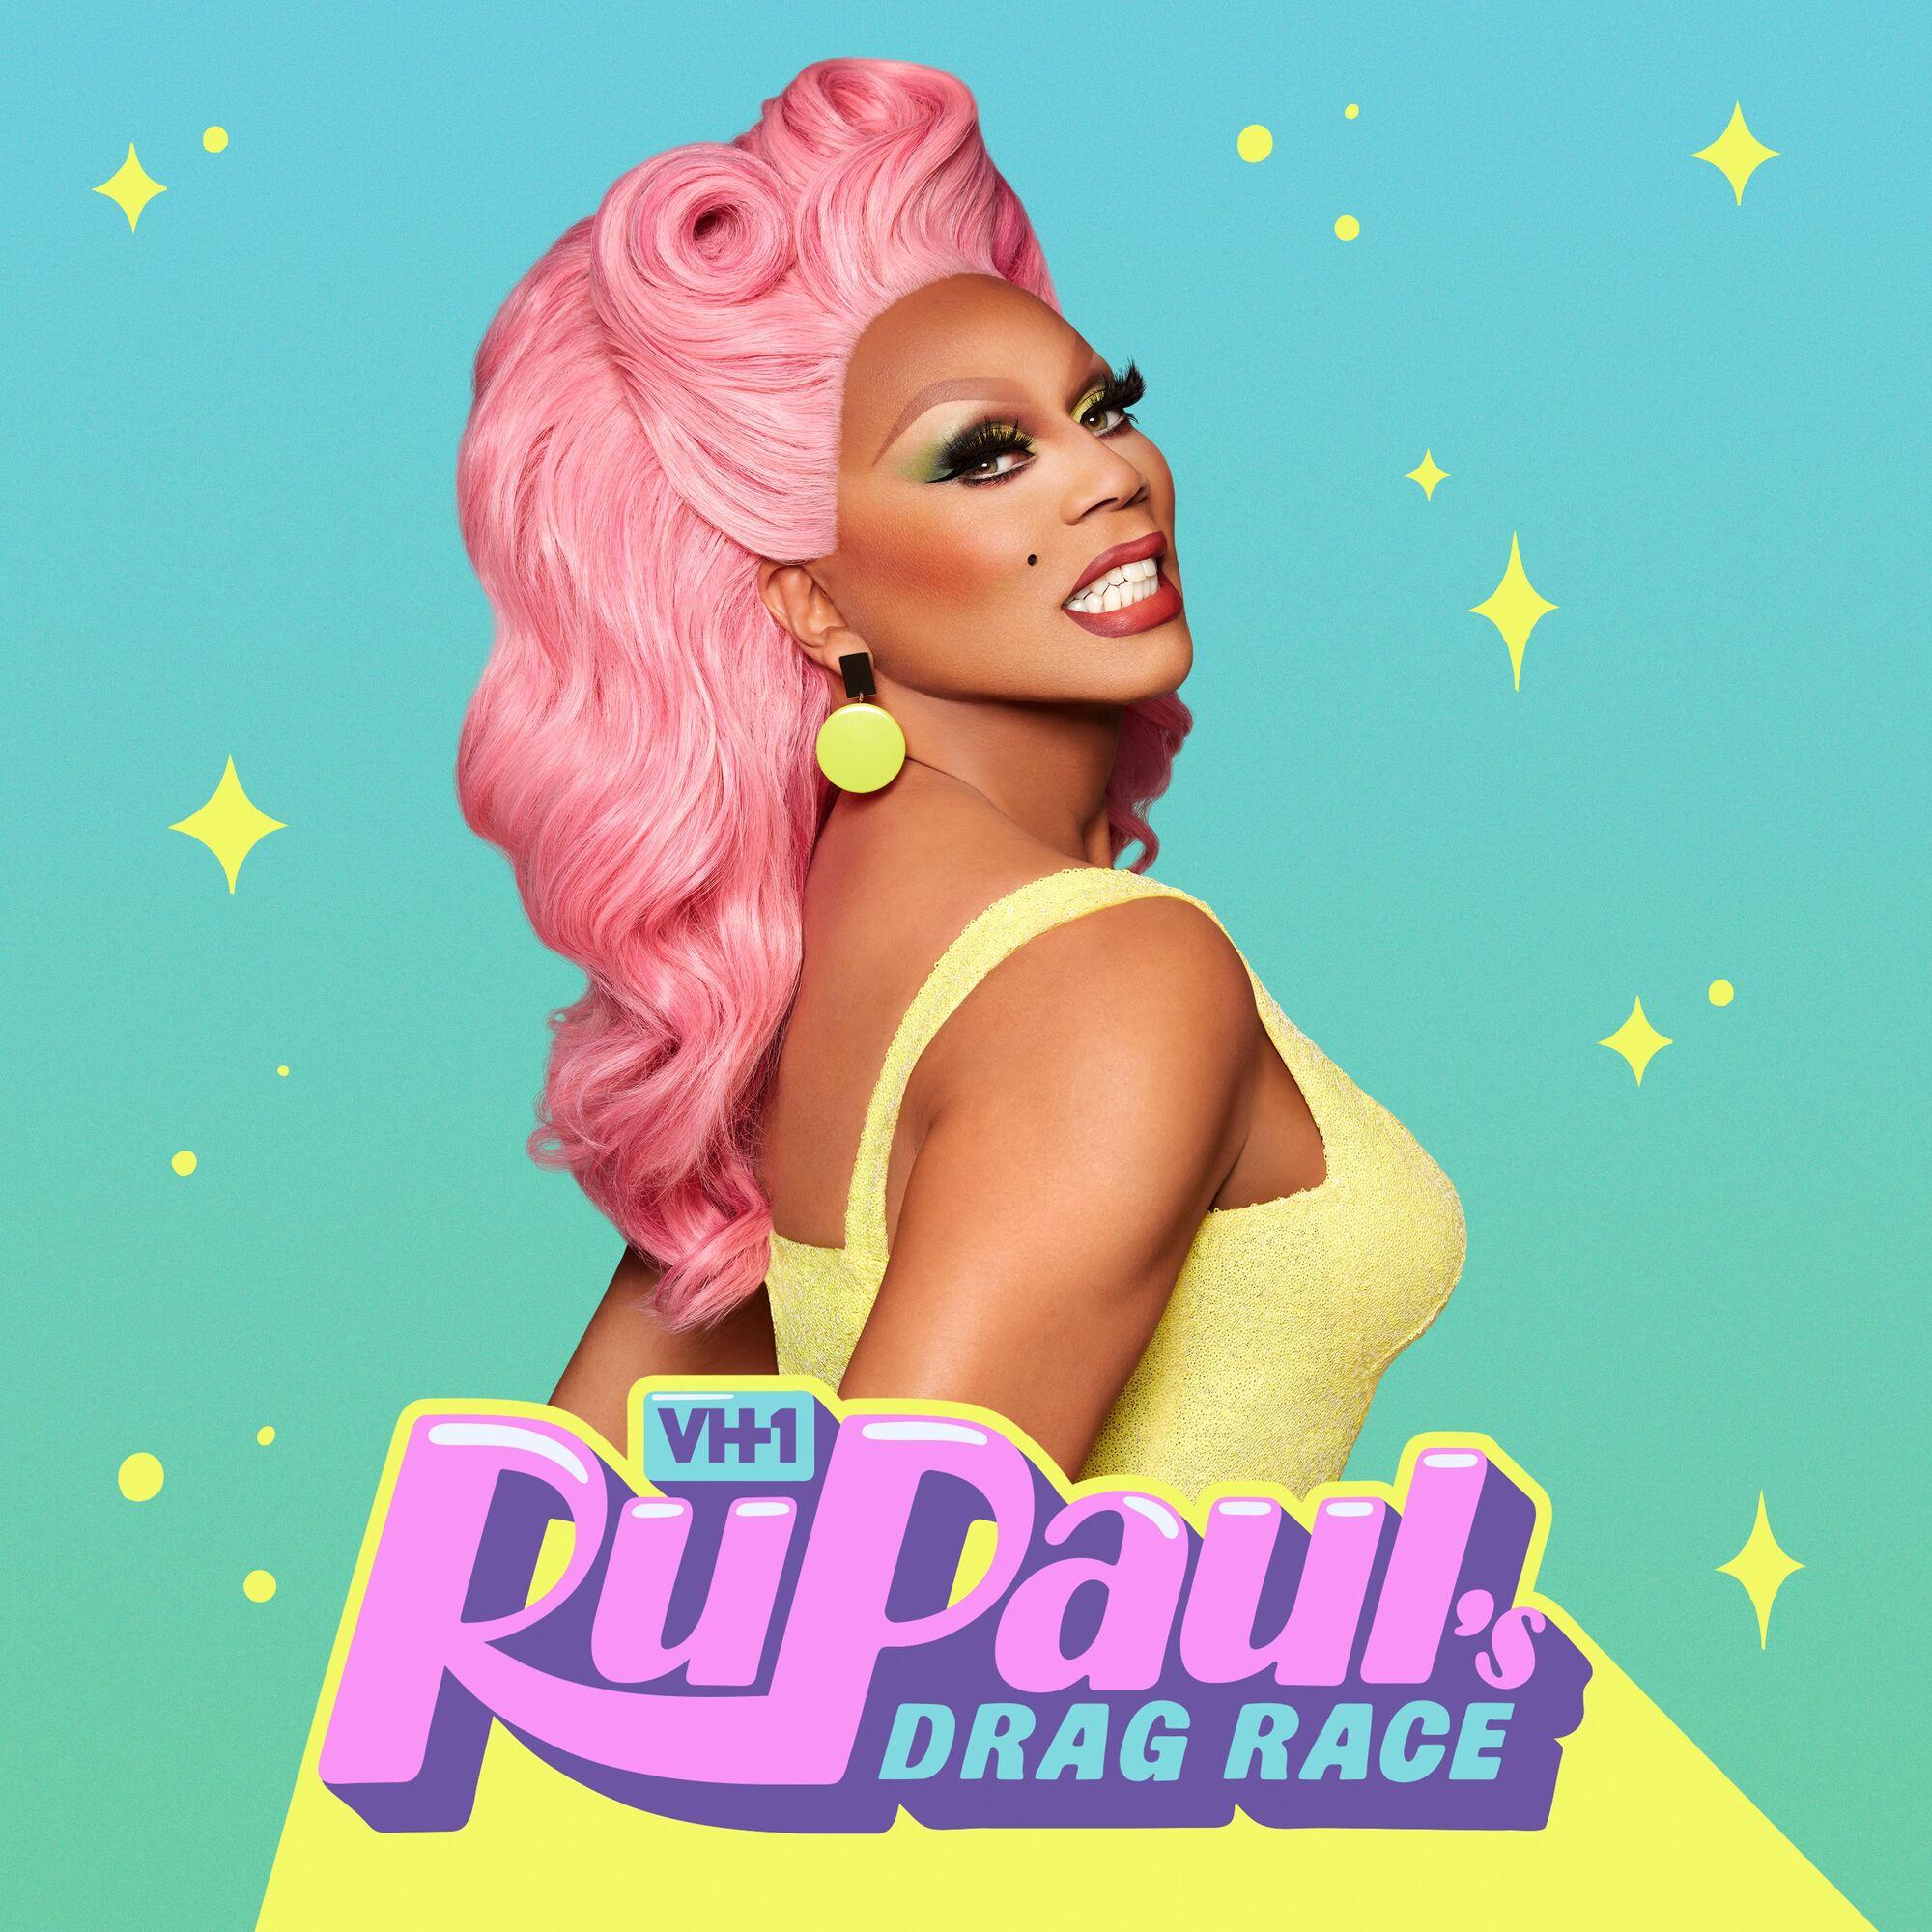 Rupaul Christmas Special 2021 Rupaul S Drag Race Season 13 Rupaul S Drag Race Wiki Fandom